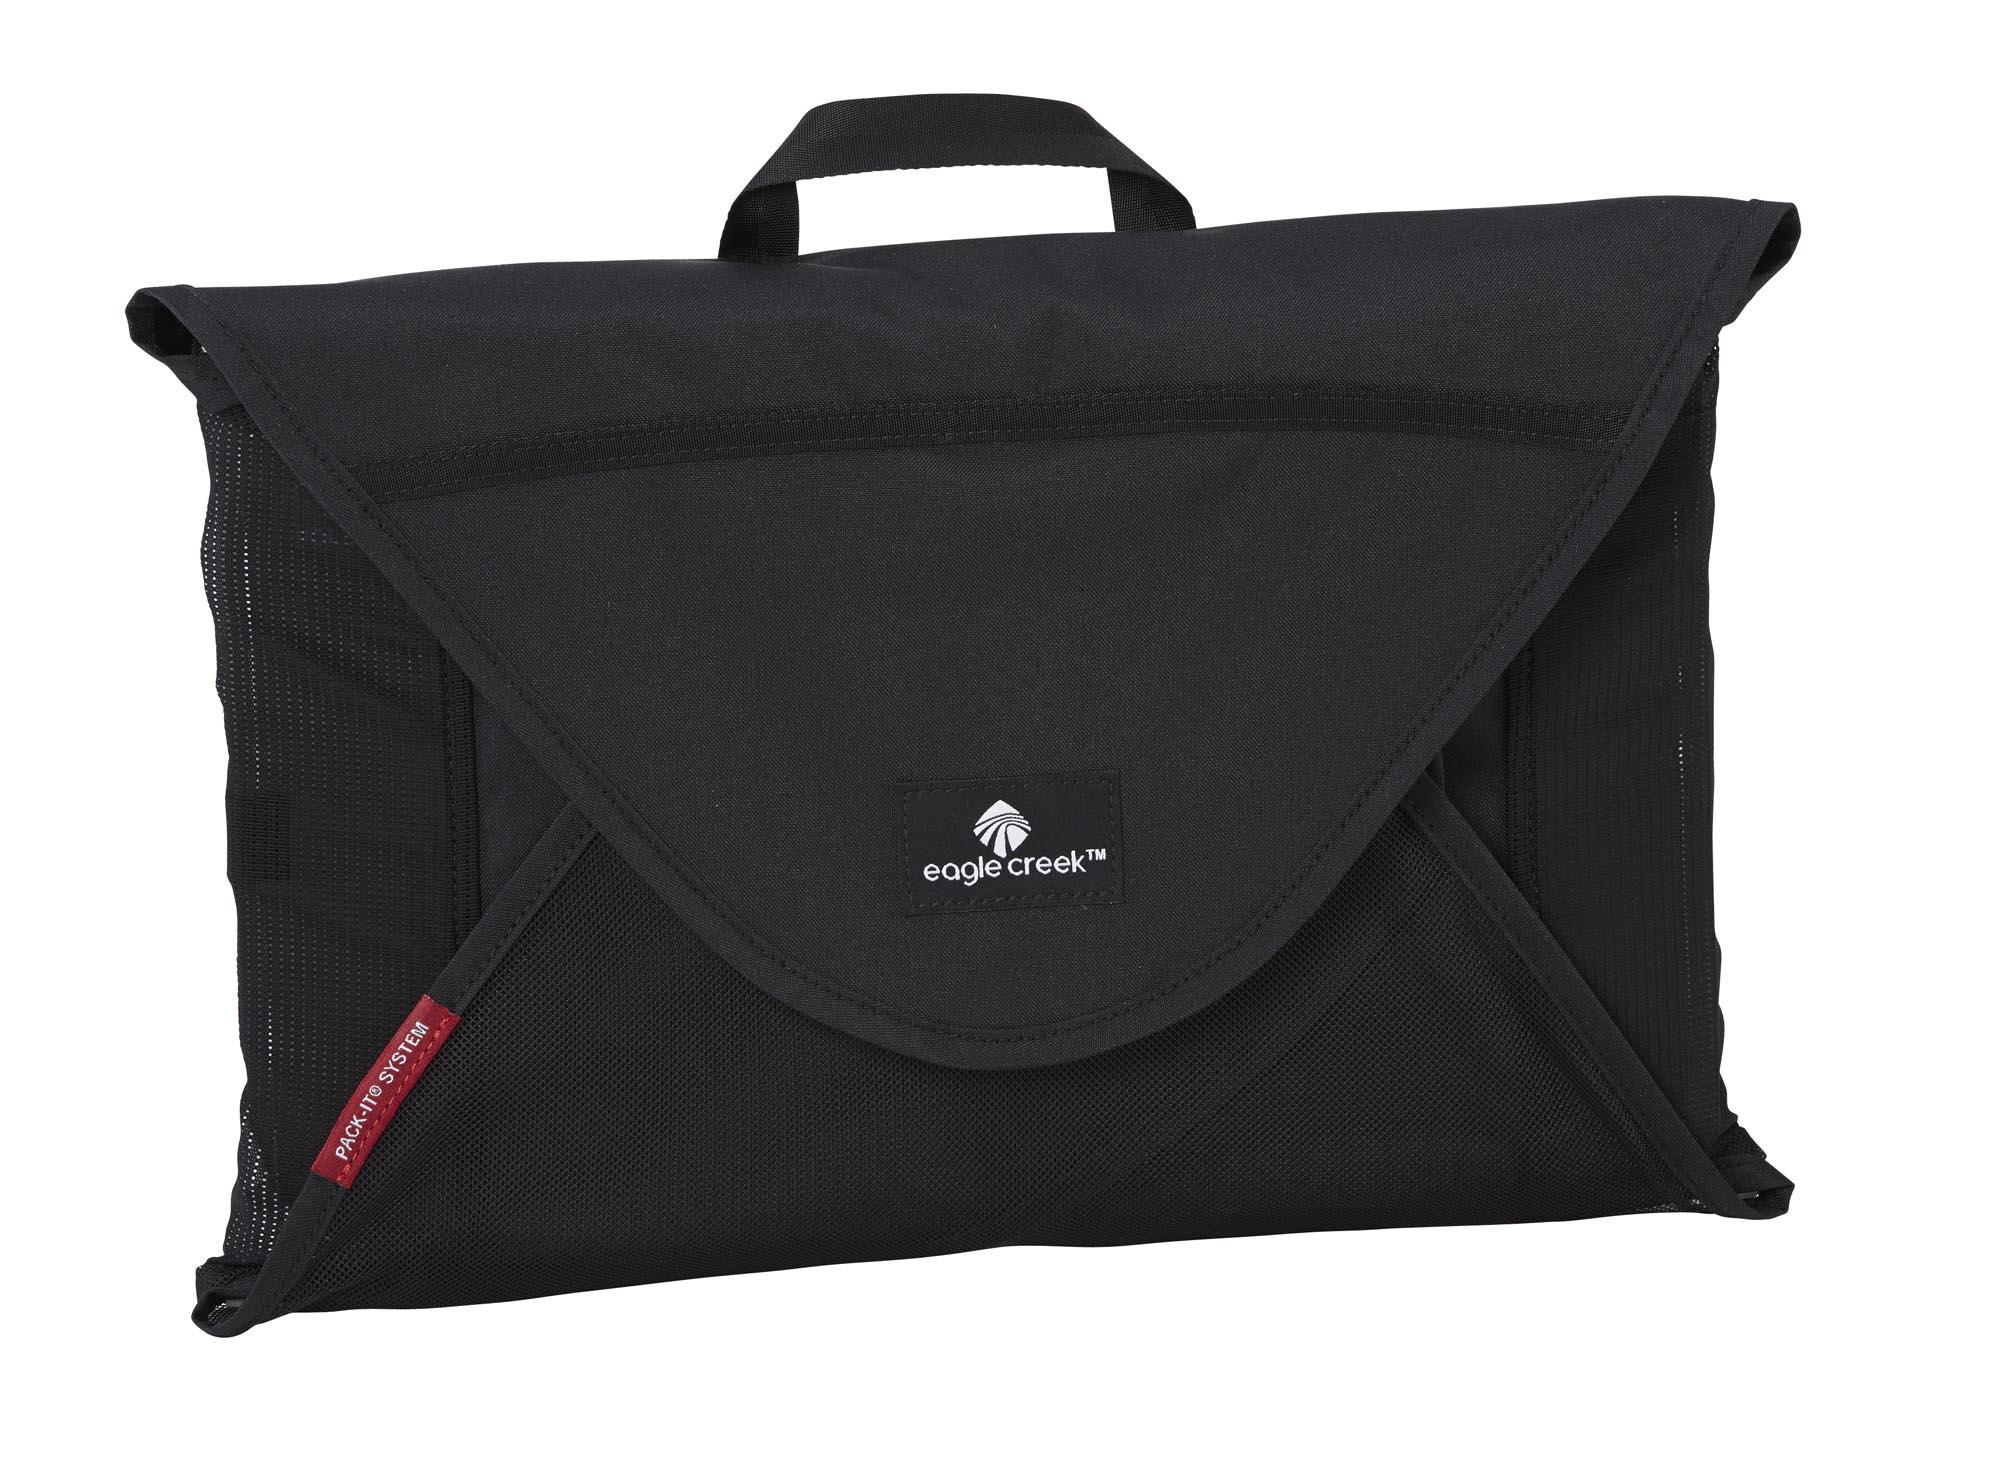 EagleCreek - Pack-It Garment Folder Small Black - Packing Bags -